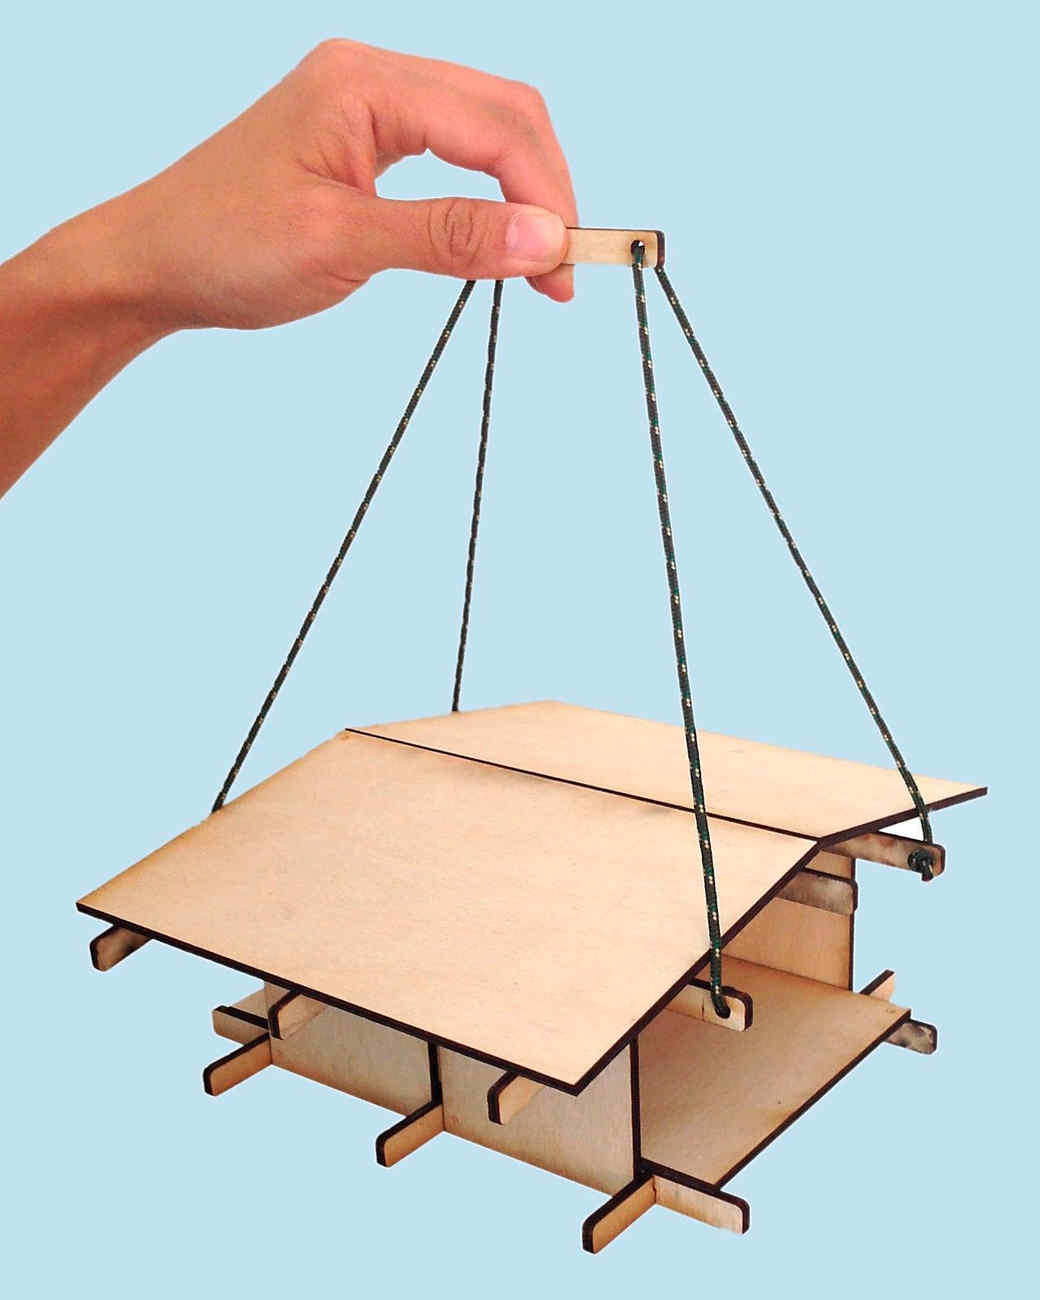 scout-regalia-birdhouse-kit-0415.jpg